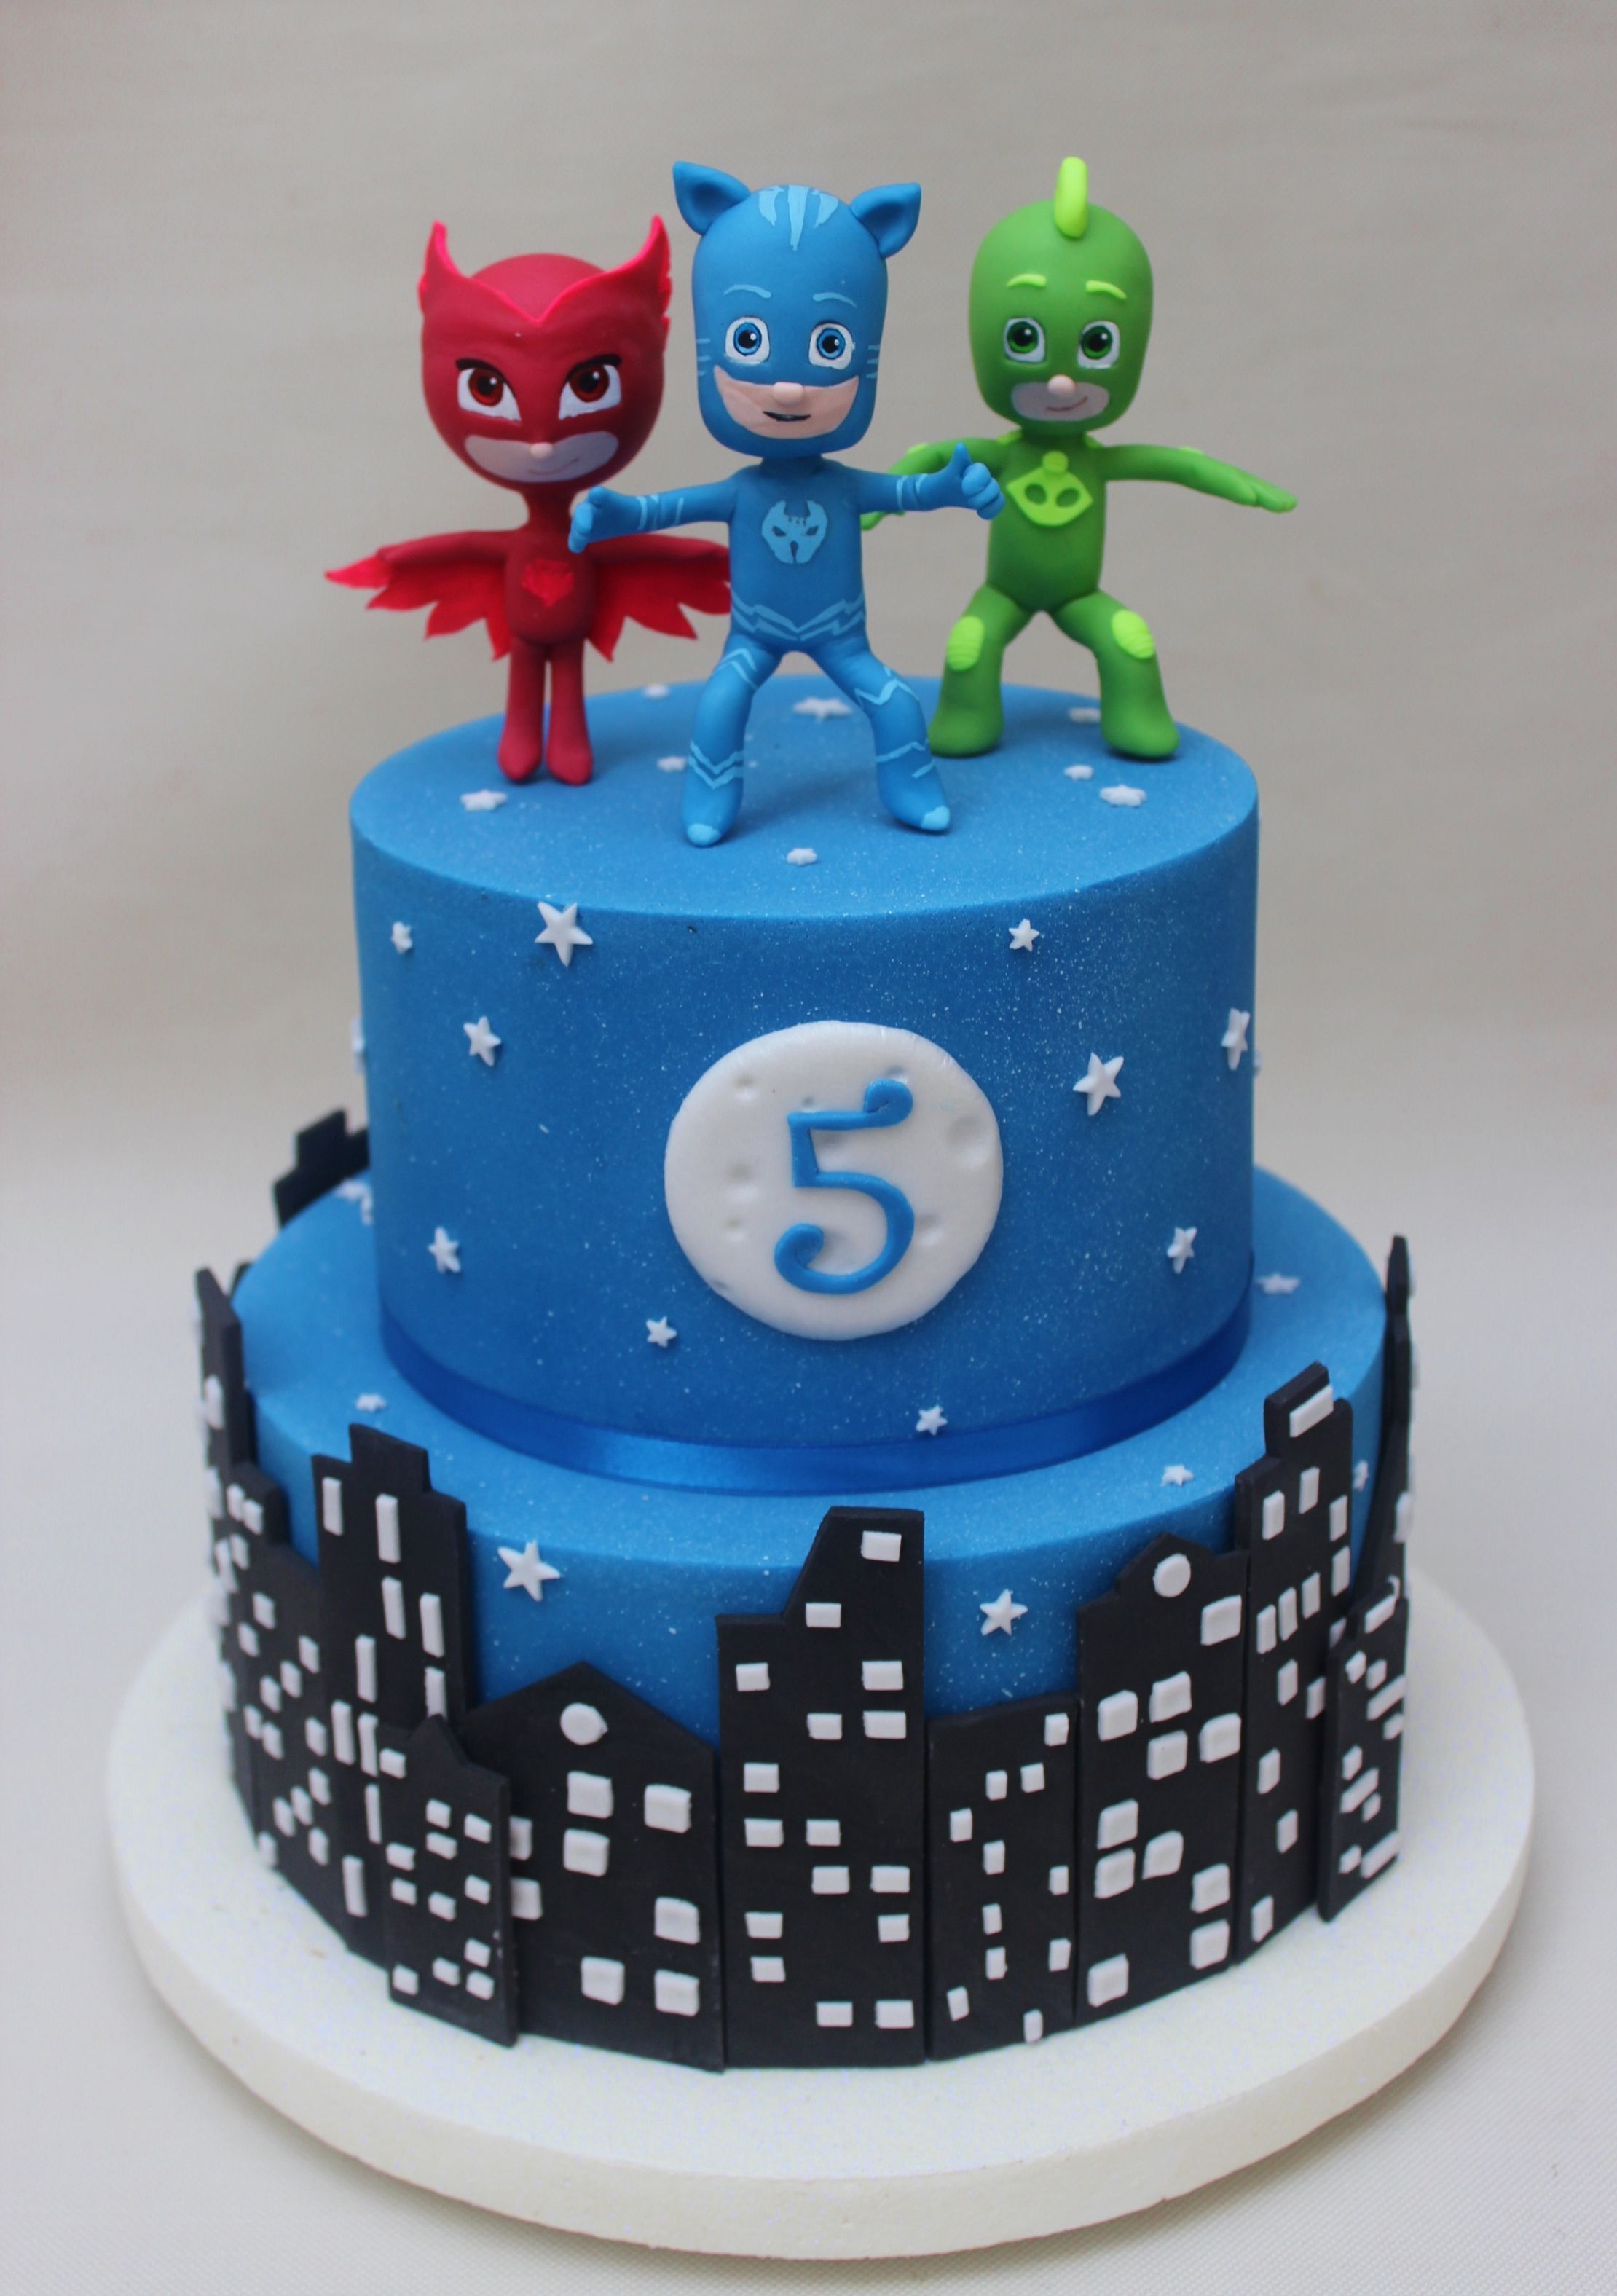 Pj Mask Cake Violeta Glace Party Ideas Pj Masks Birthday Cake